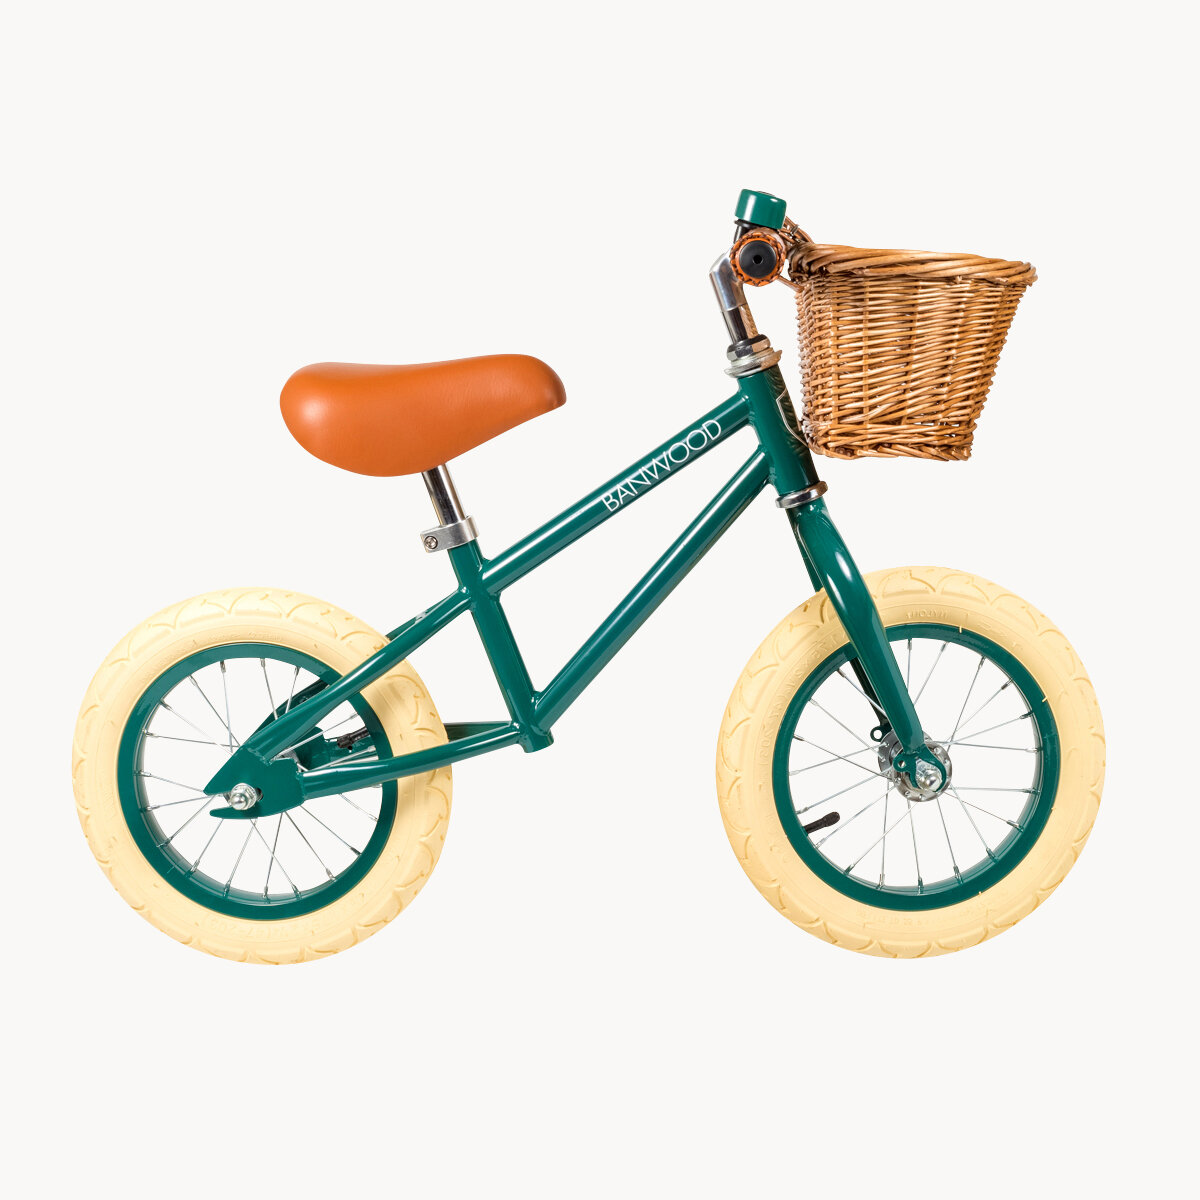 Banwood-First-Go-Balance-Bike-Dark-Green.jpg